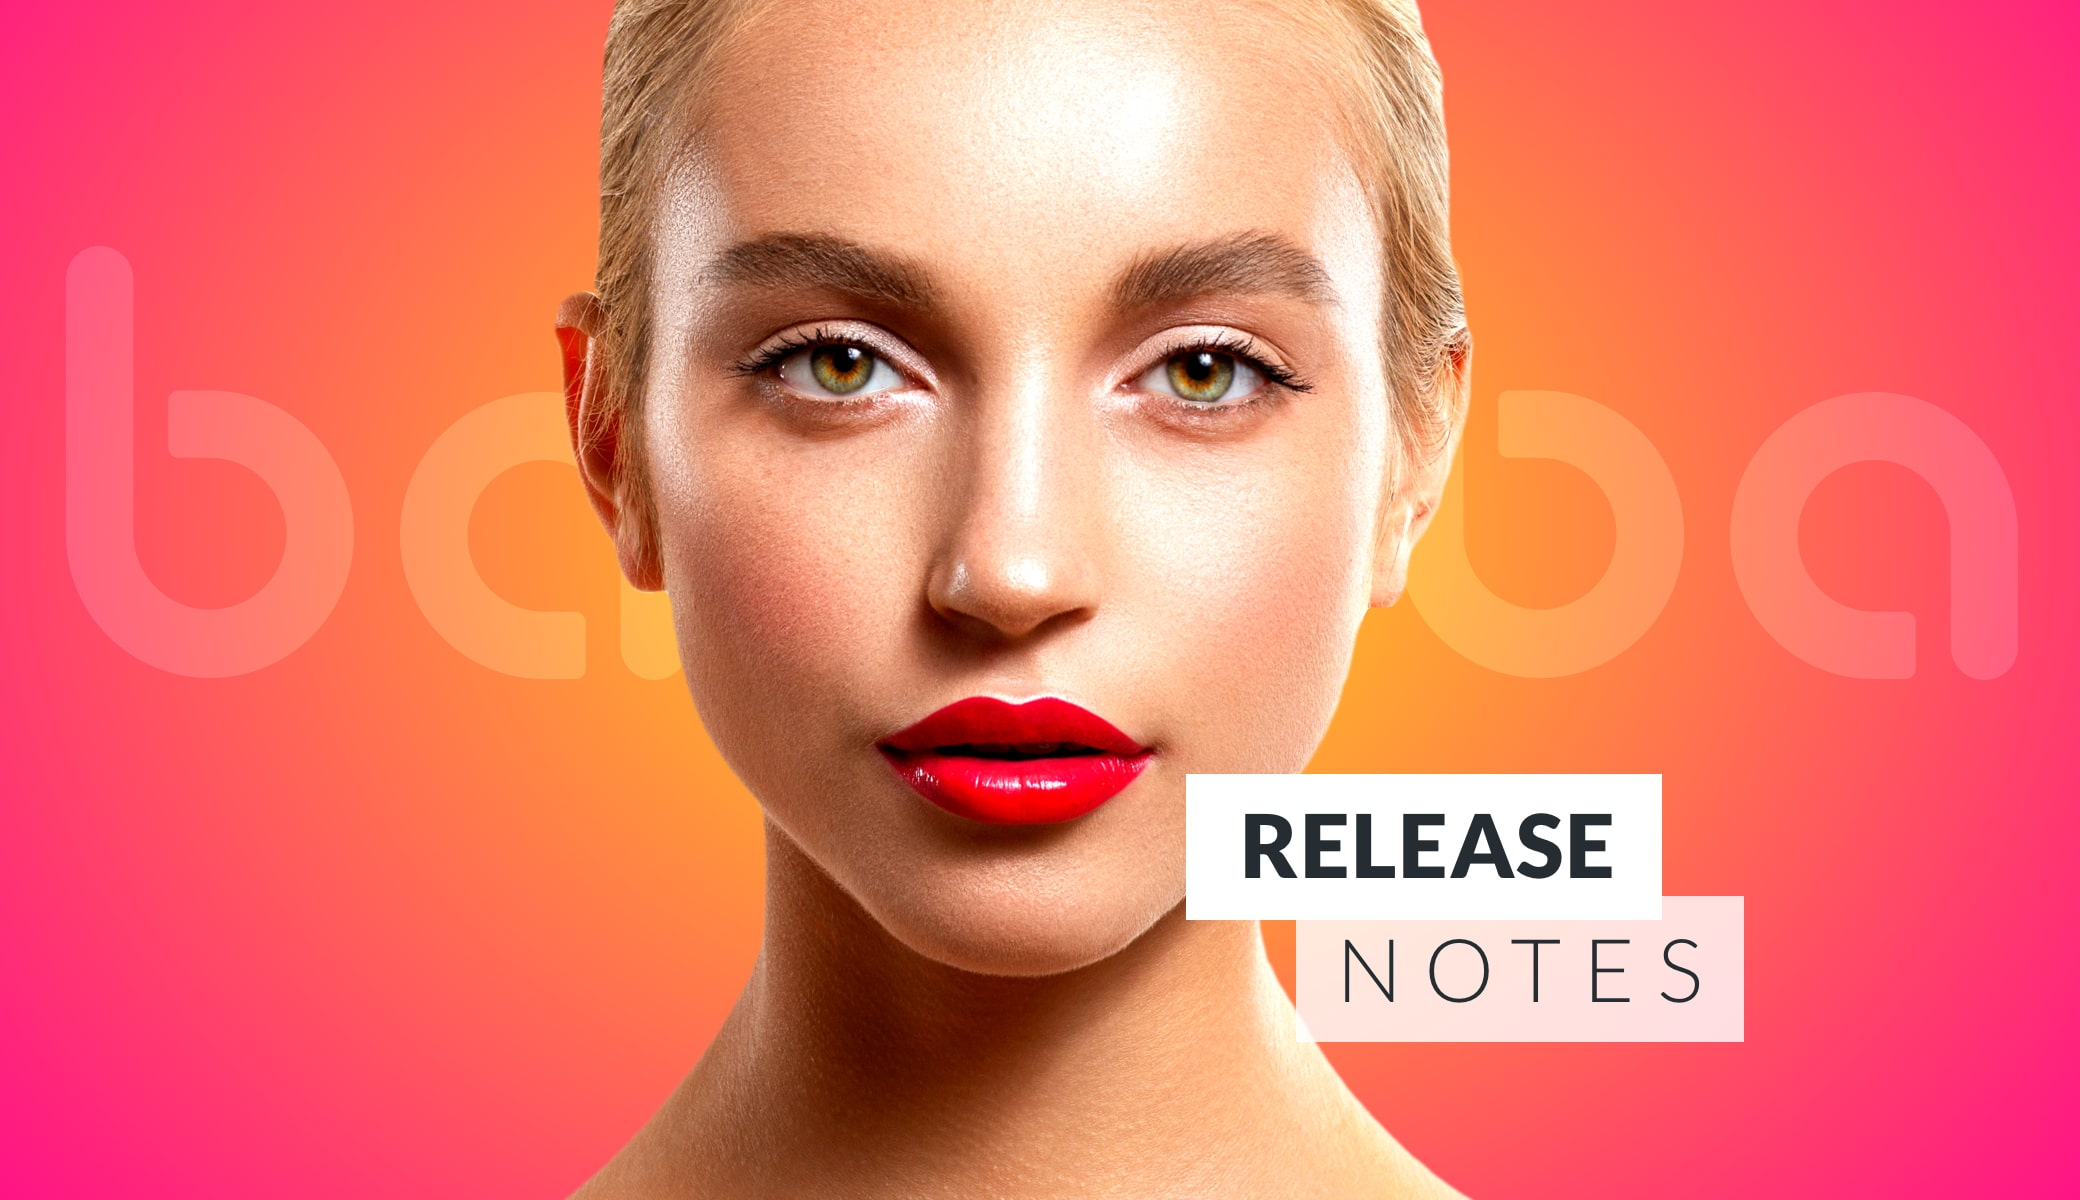 Face_AR_SDK__Release_v0.34.1_Improved_Skin_Smoothing_&__Effect _Processing